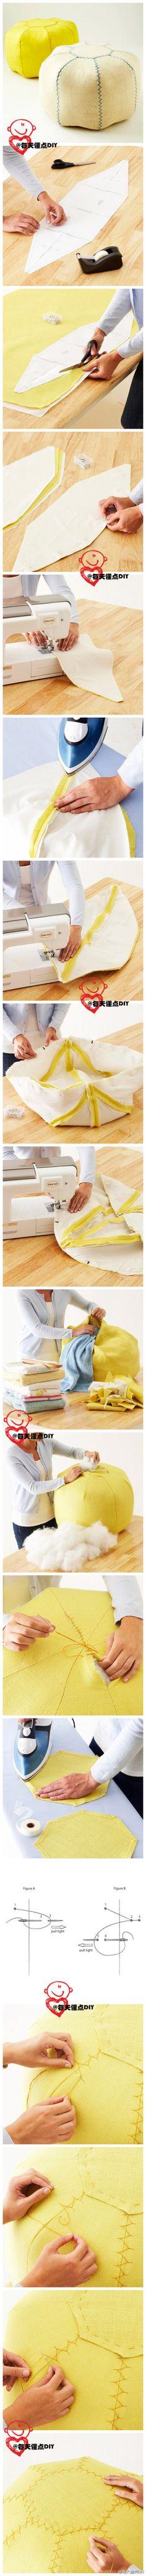 Step-by-step pouf photos